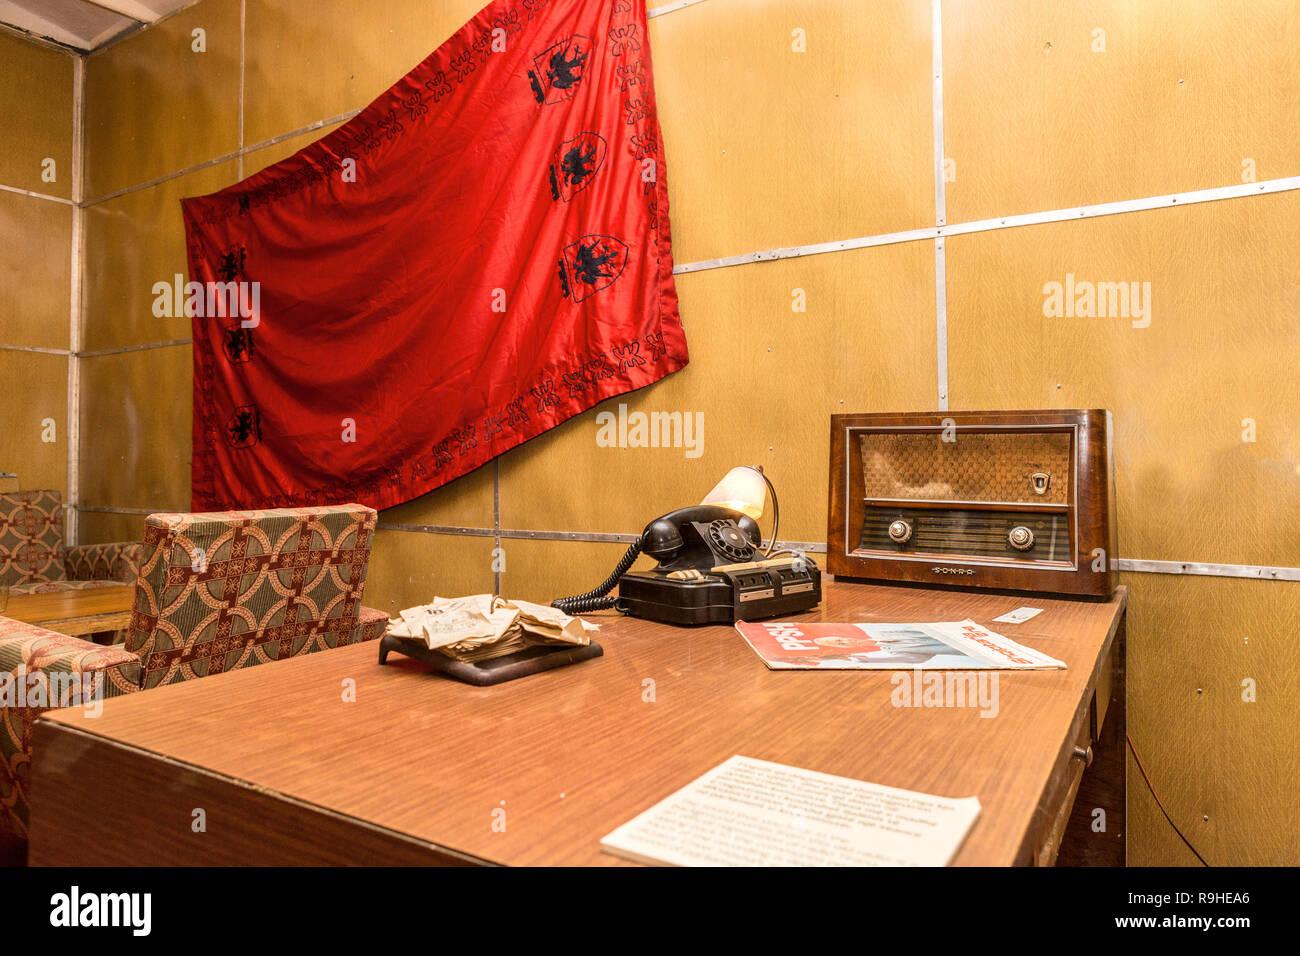 Offices Bunk'Art nuclear bunker Tirana Albania - Stock Image